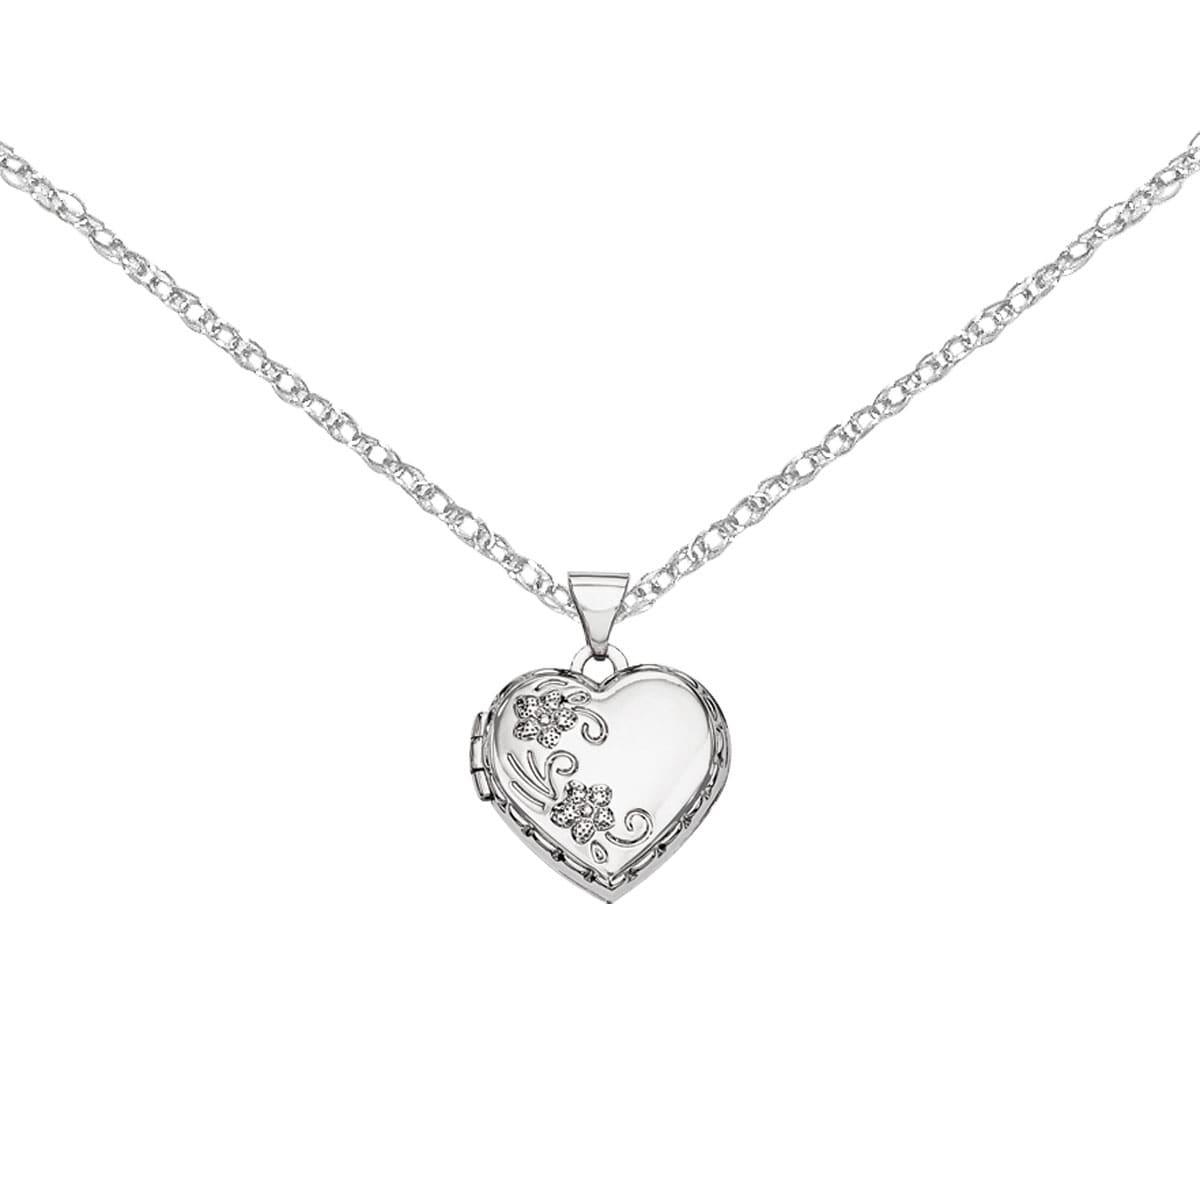 Versil 14k White Gold Polished Heart-shaped Reversible Fl...